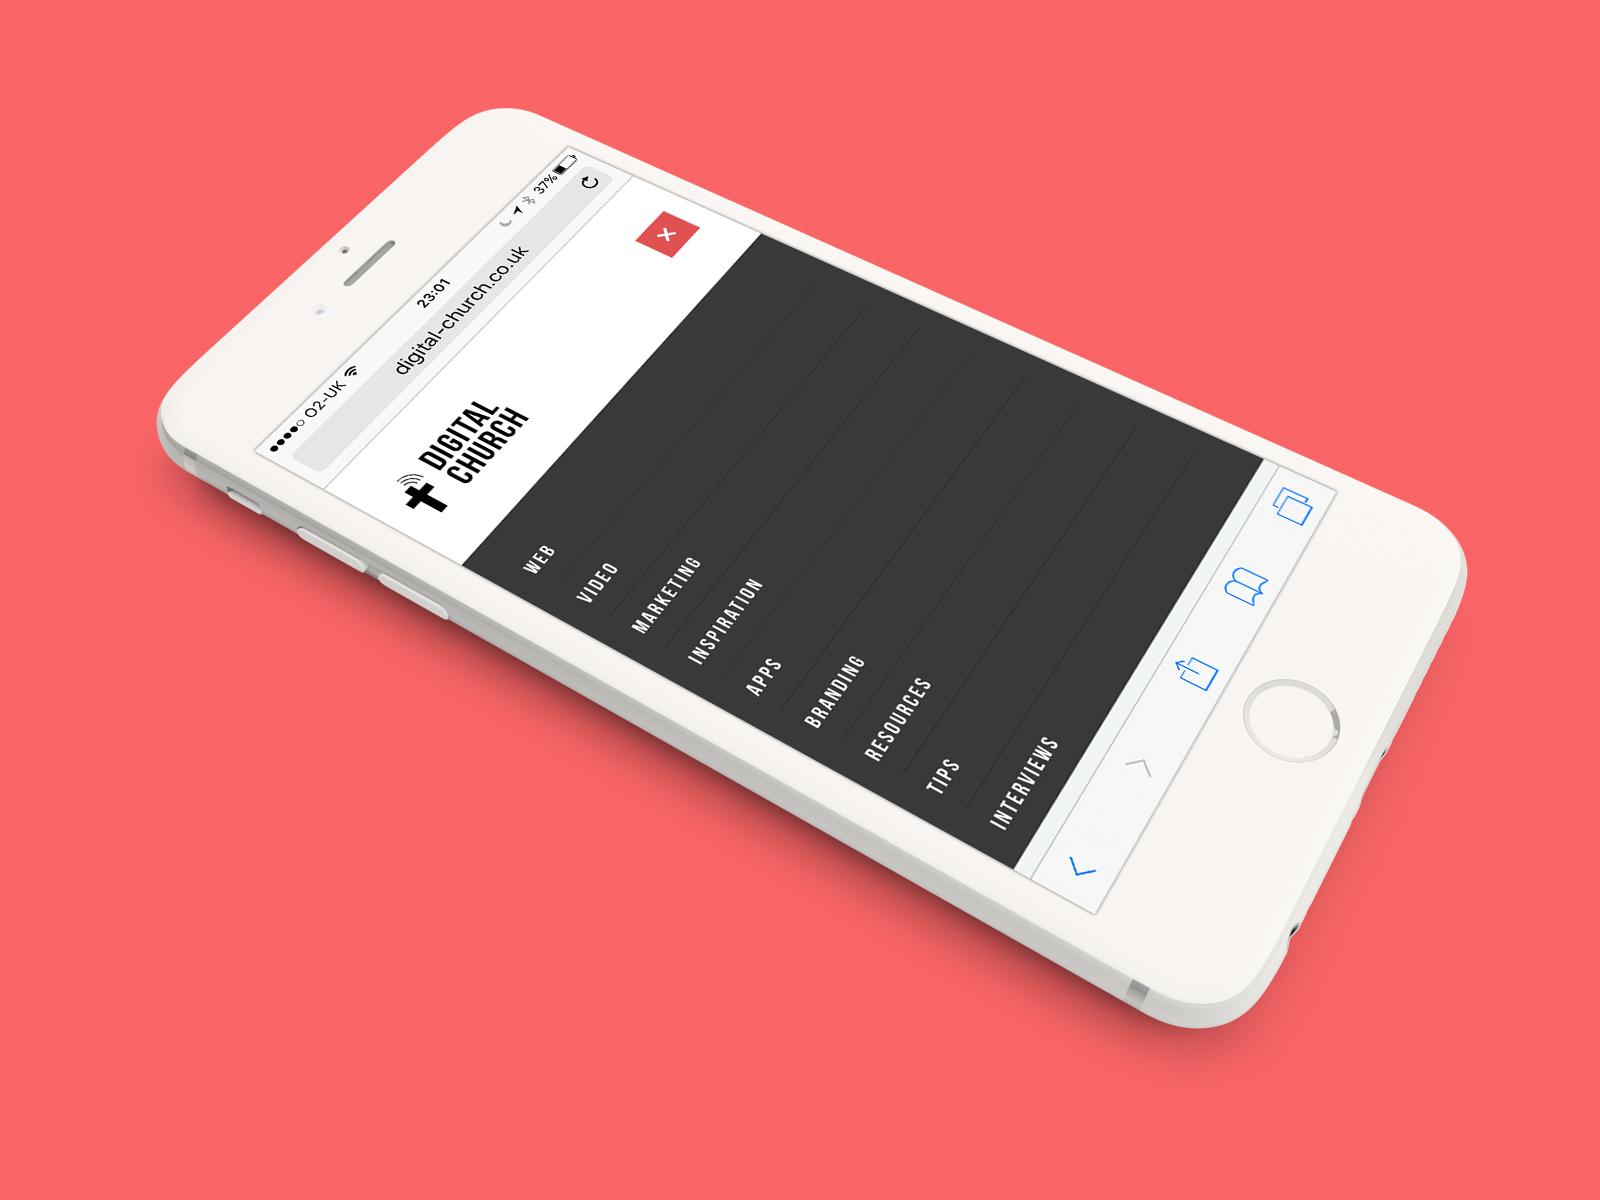 digitalchurch-iphone-2